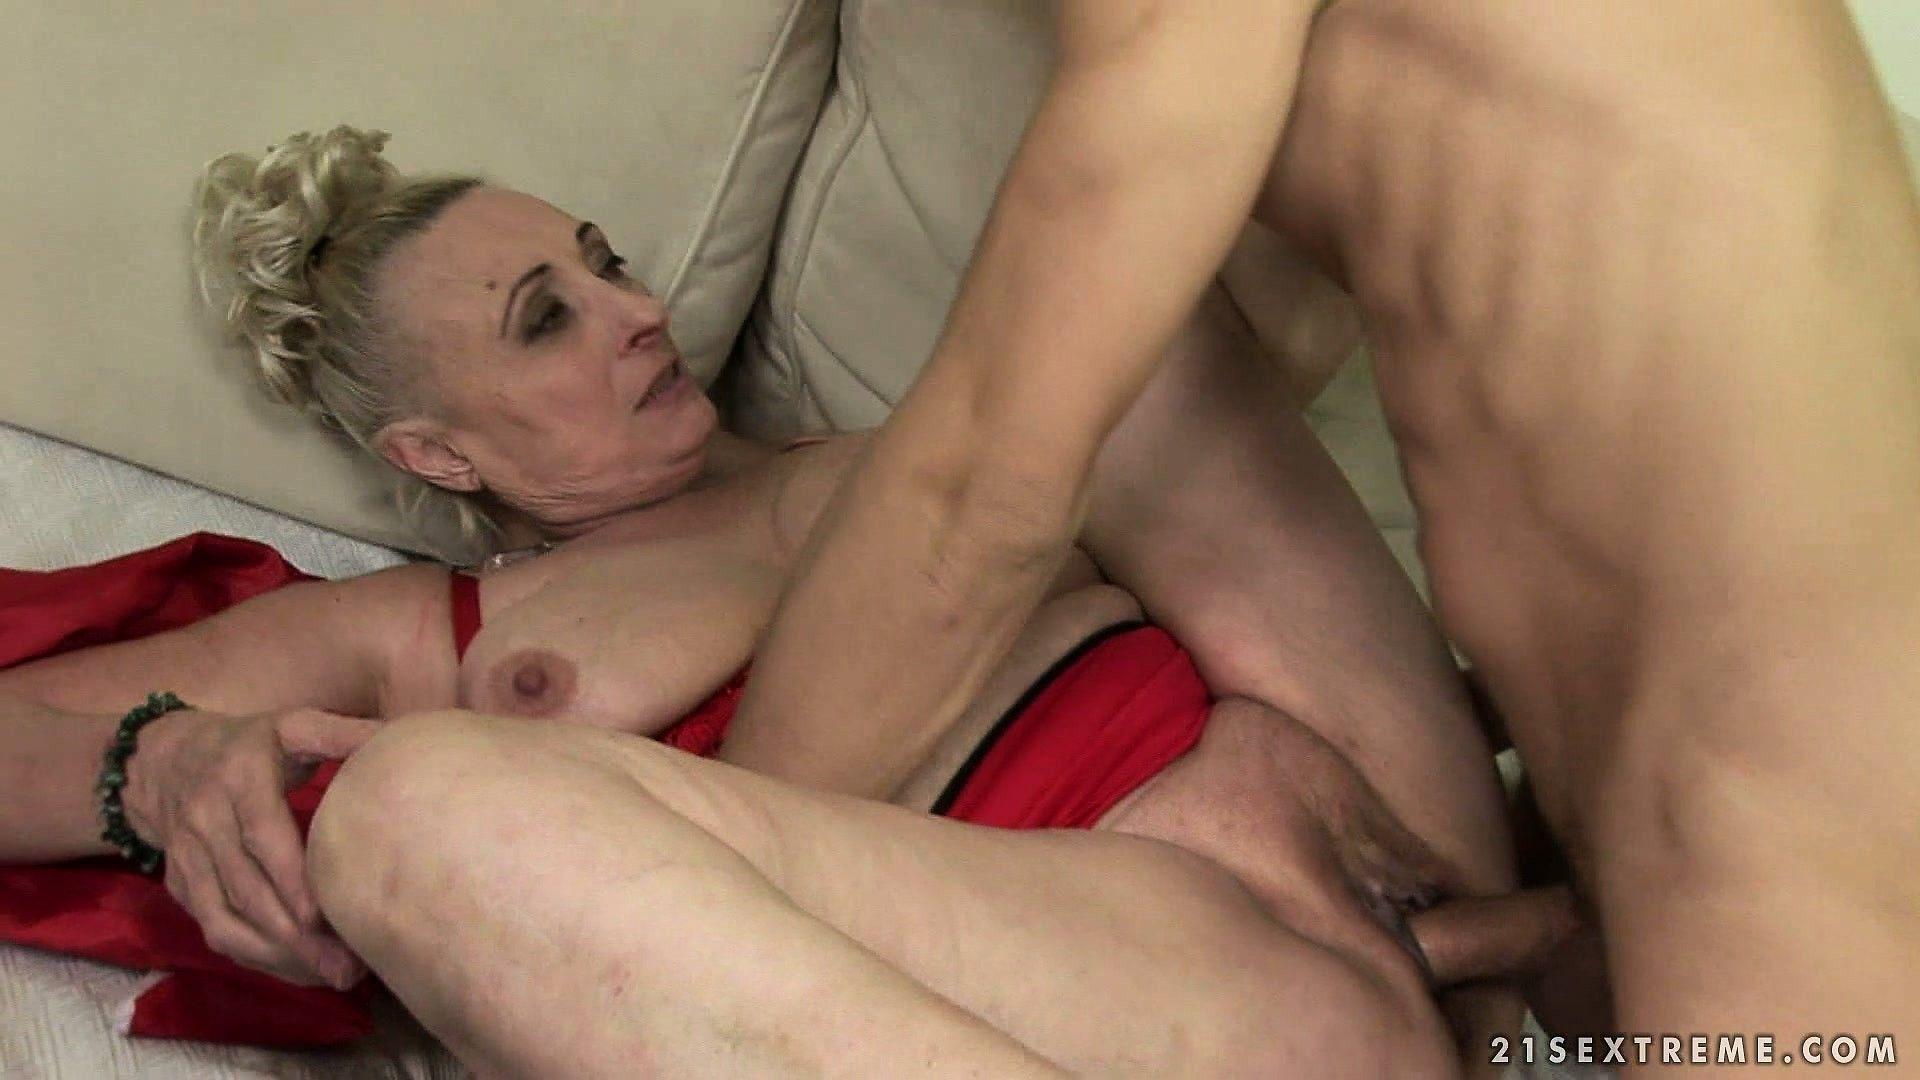 Man woman intercourse videos free sites